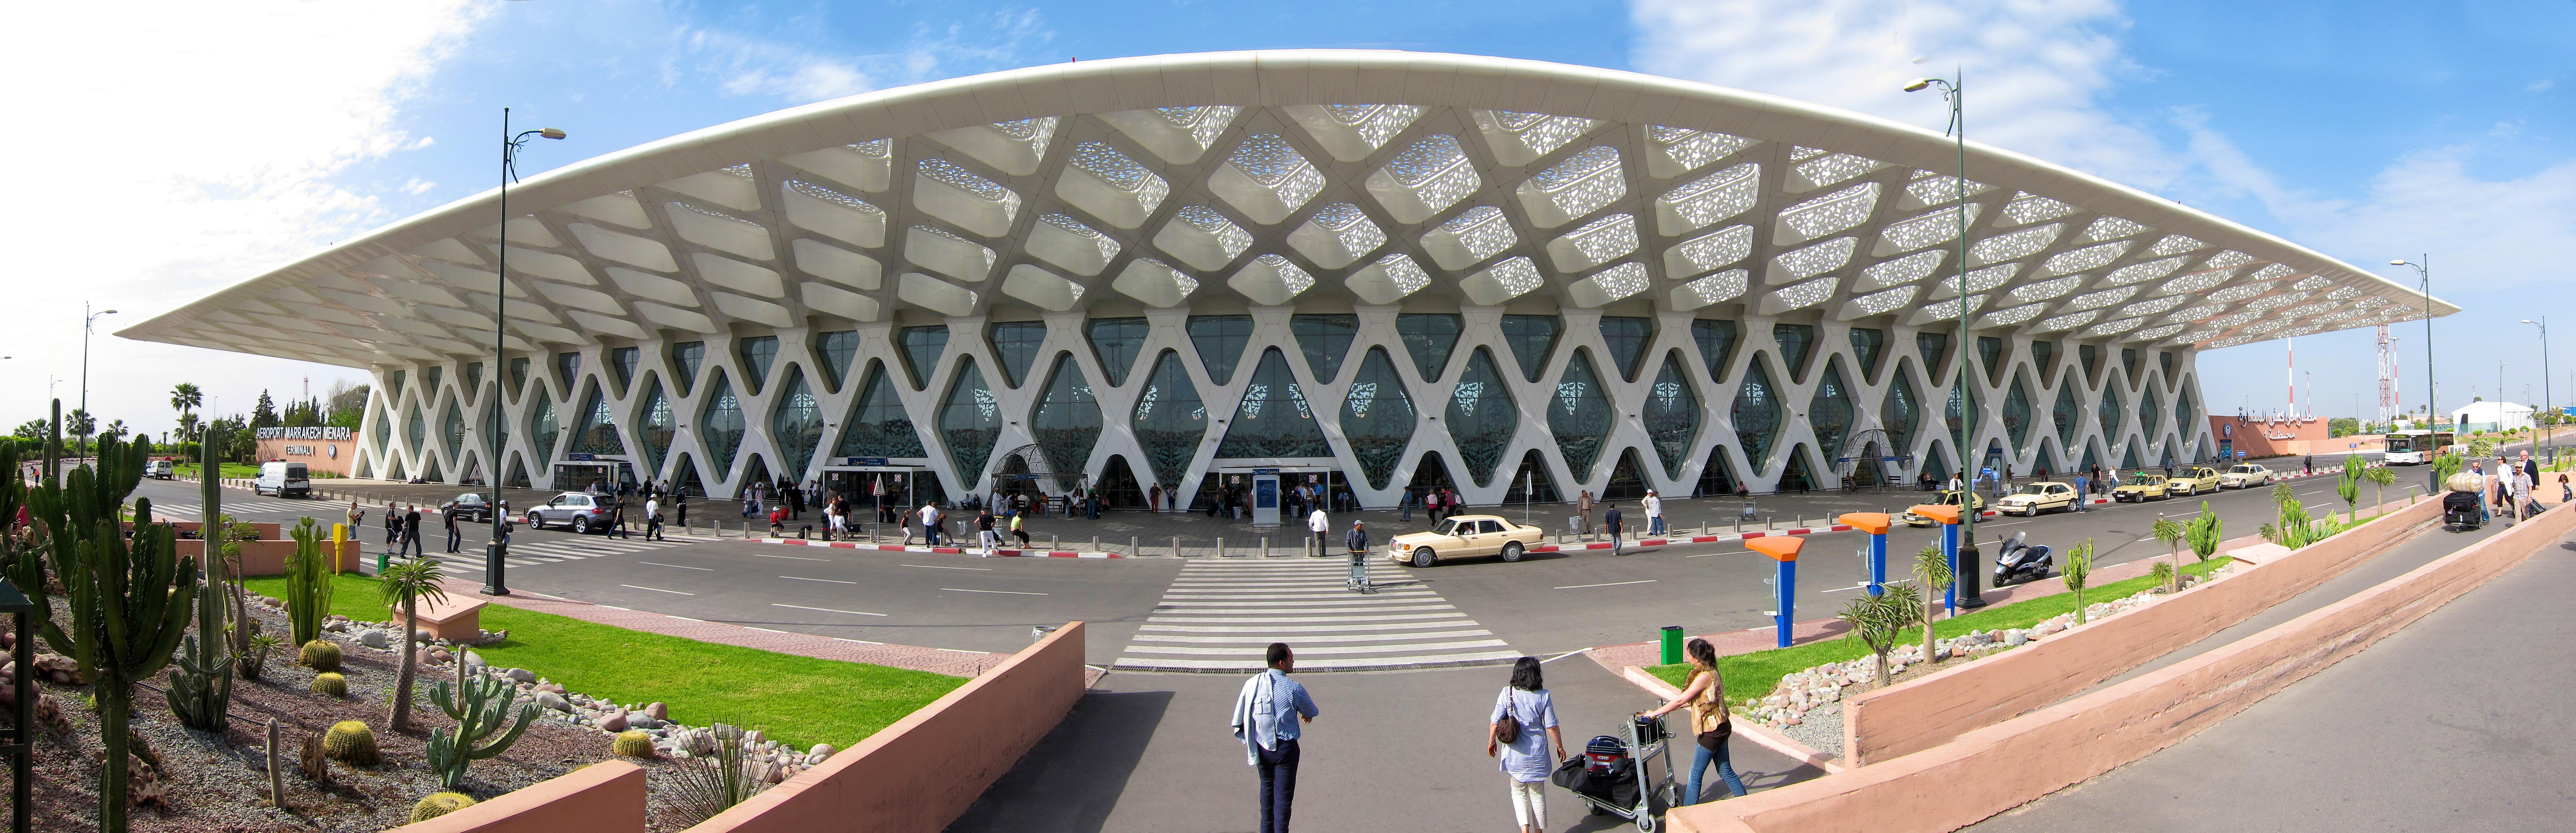 Аэропорт Марракеша-Менара